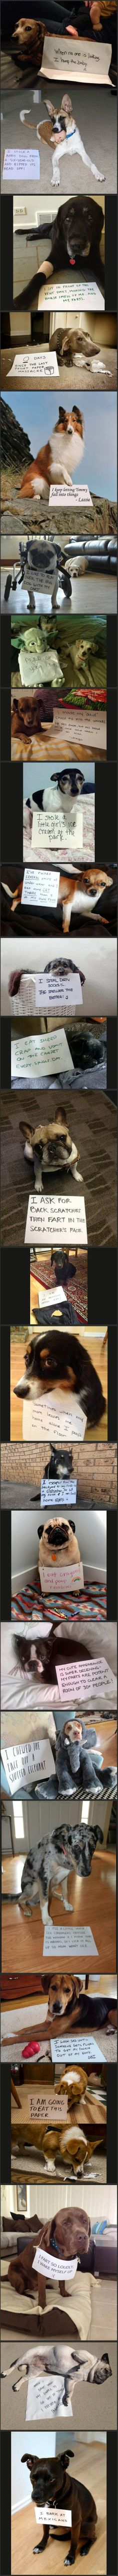 More dog punishment!!